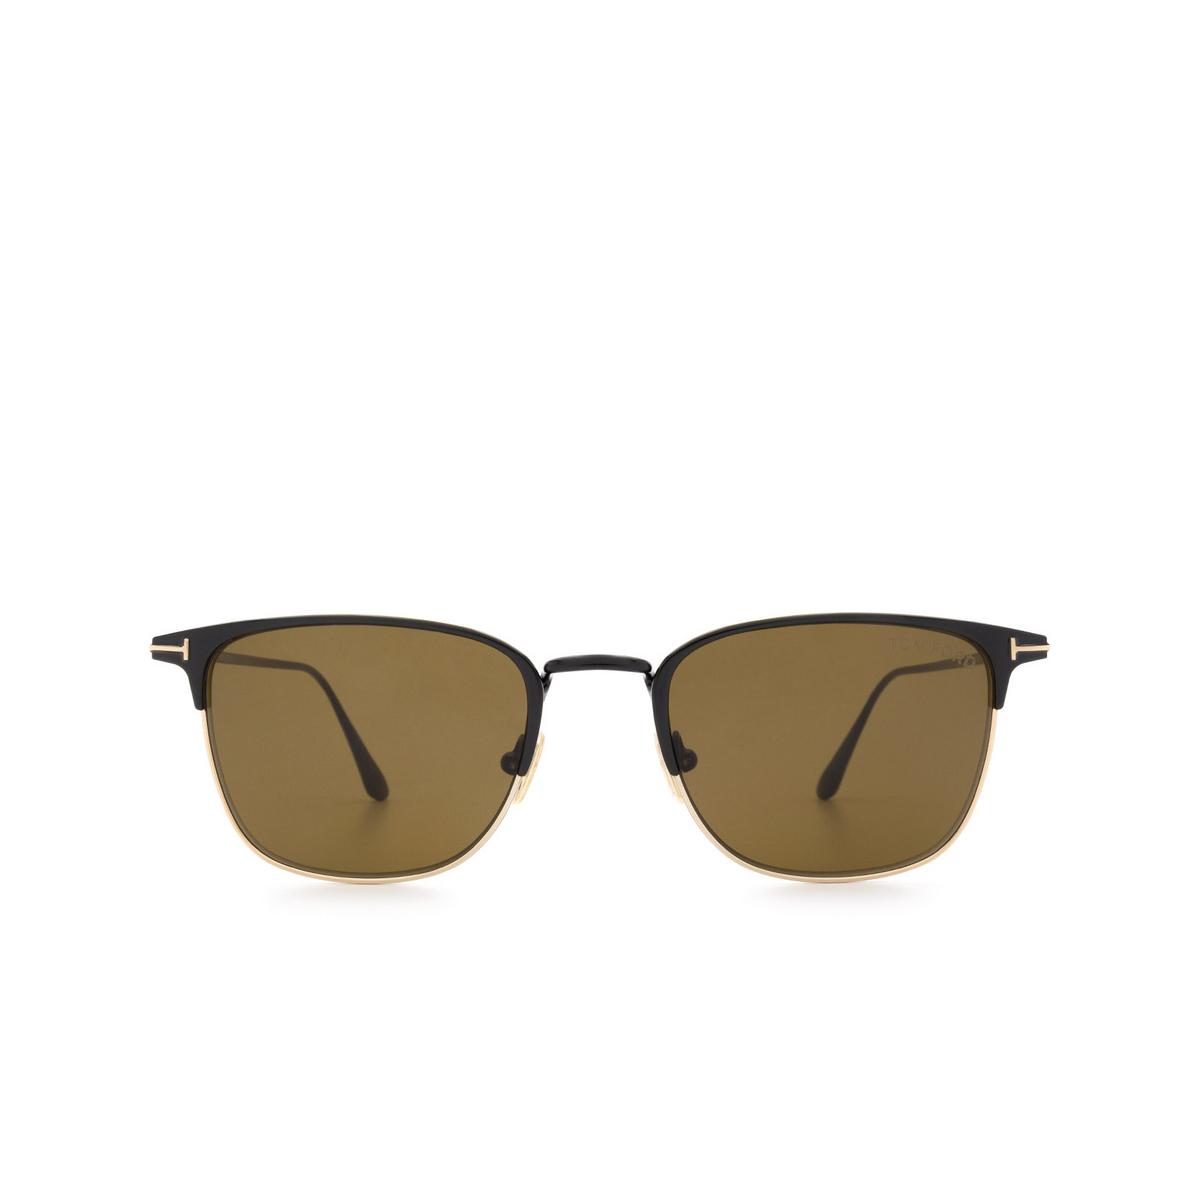 Tom Ford® Square Sunglasses: Liv FT0851 color Black 01J - front view.